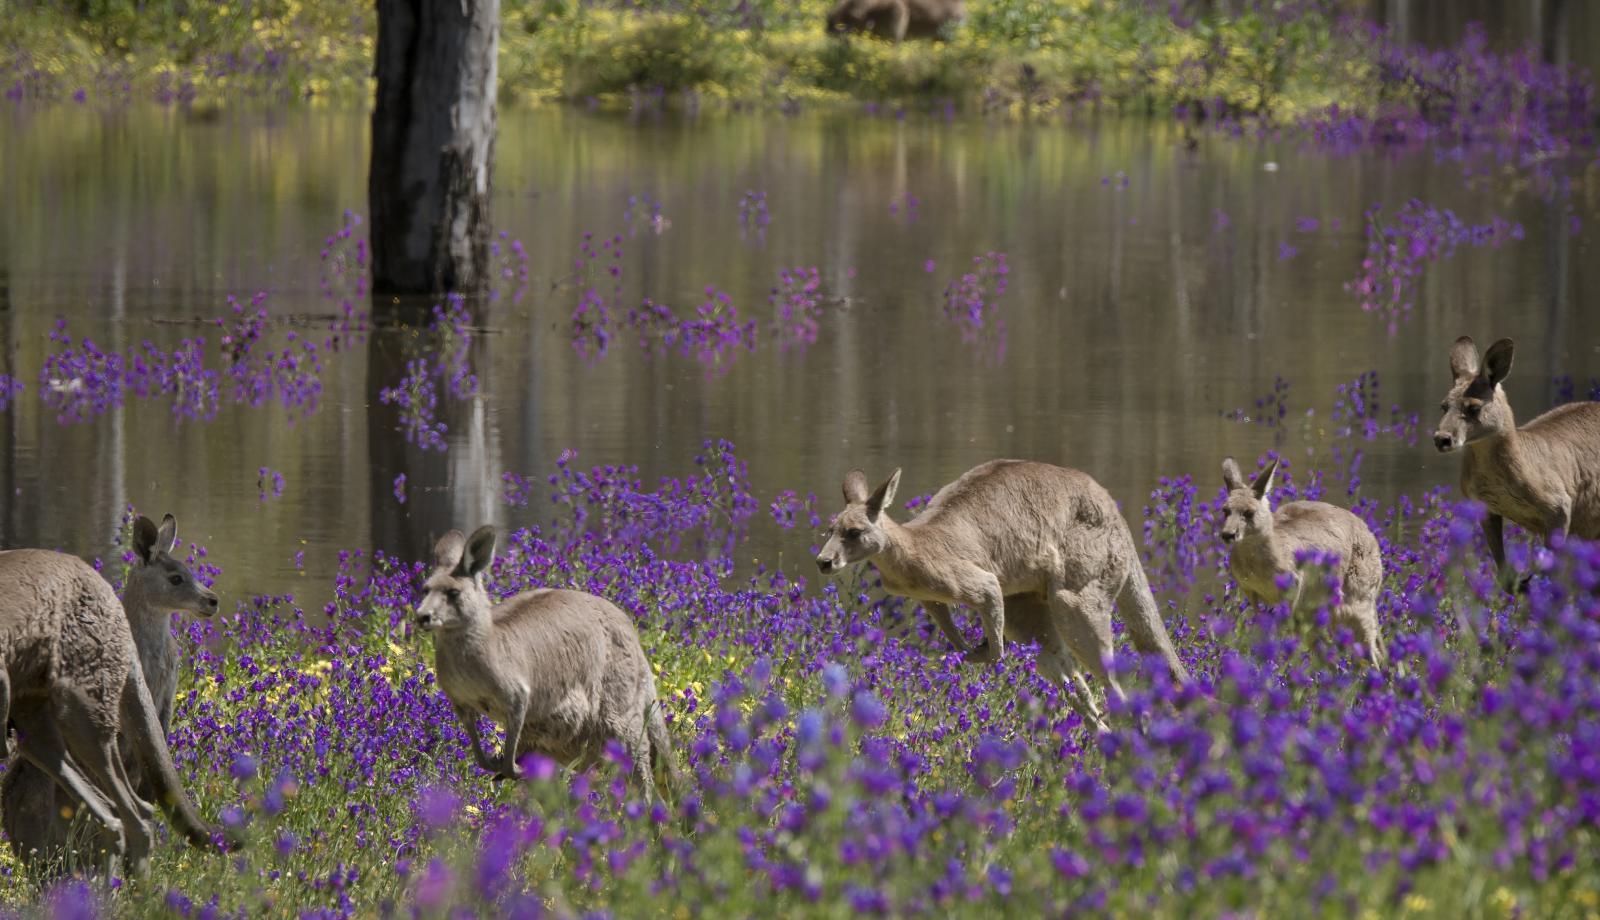 Kangaroo meat industry suggested